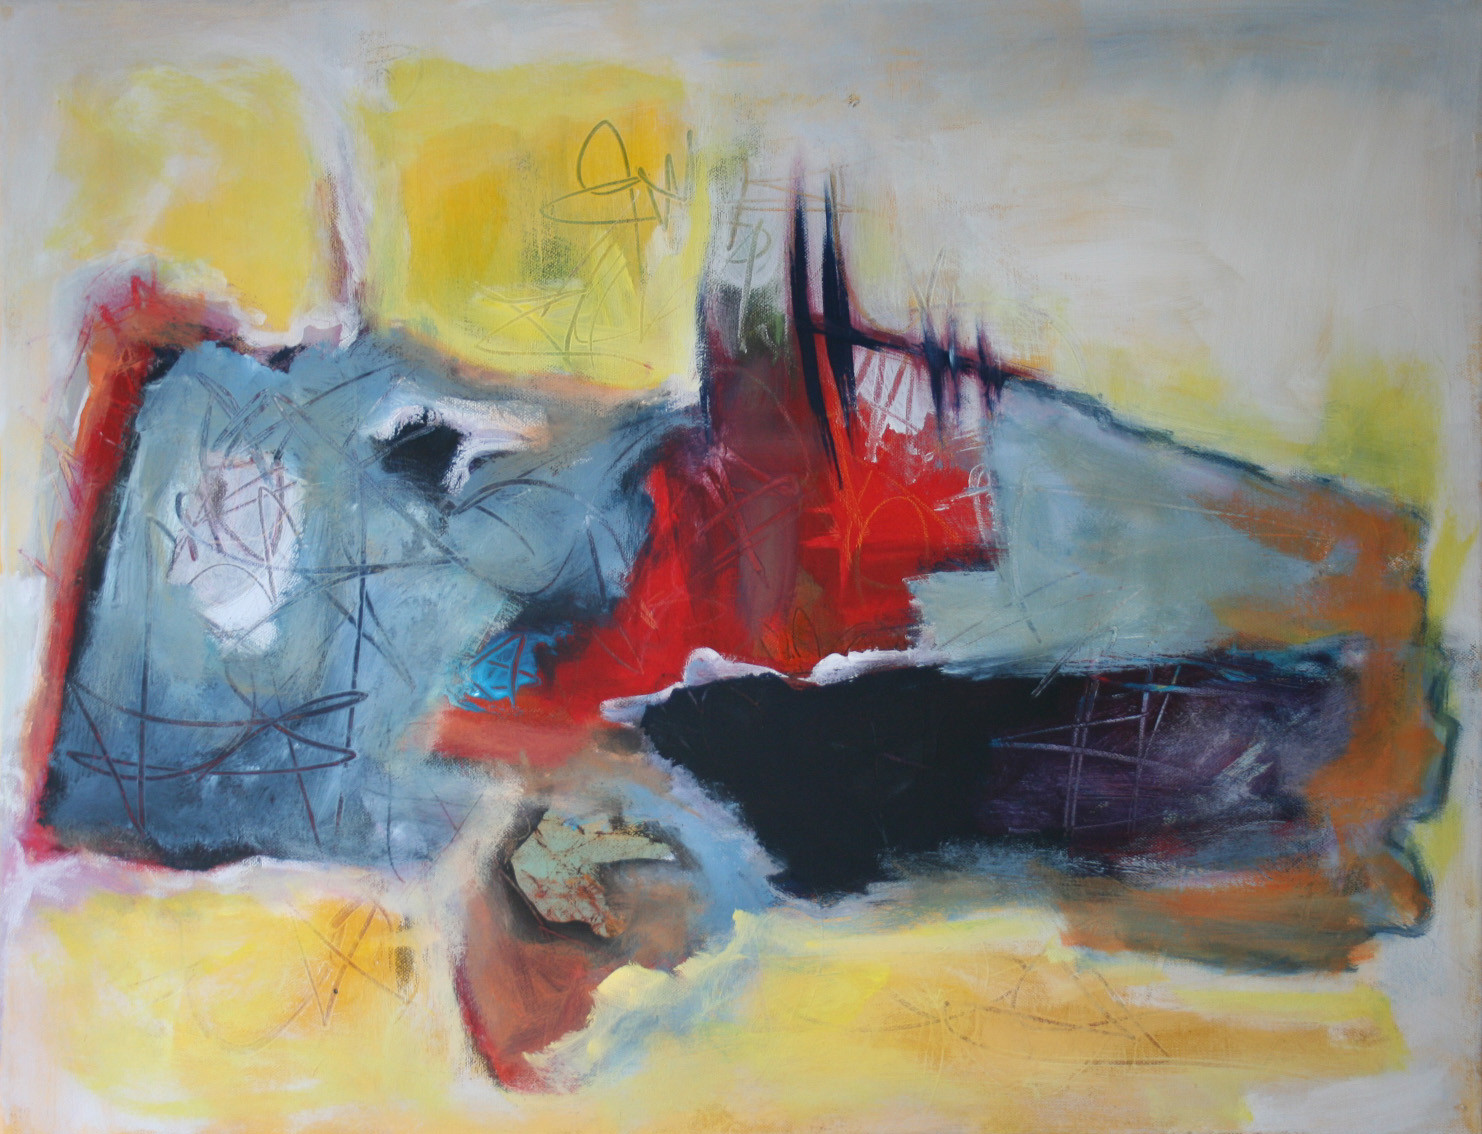 Freiheit II, , Öl und Acryl auf Leinwand, 58 x 76 cm